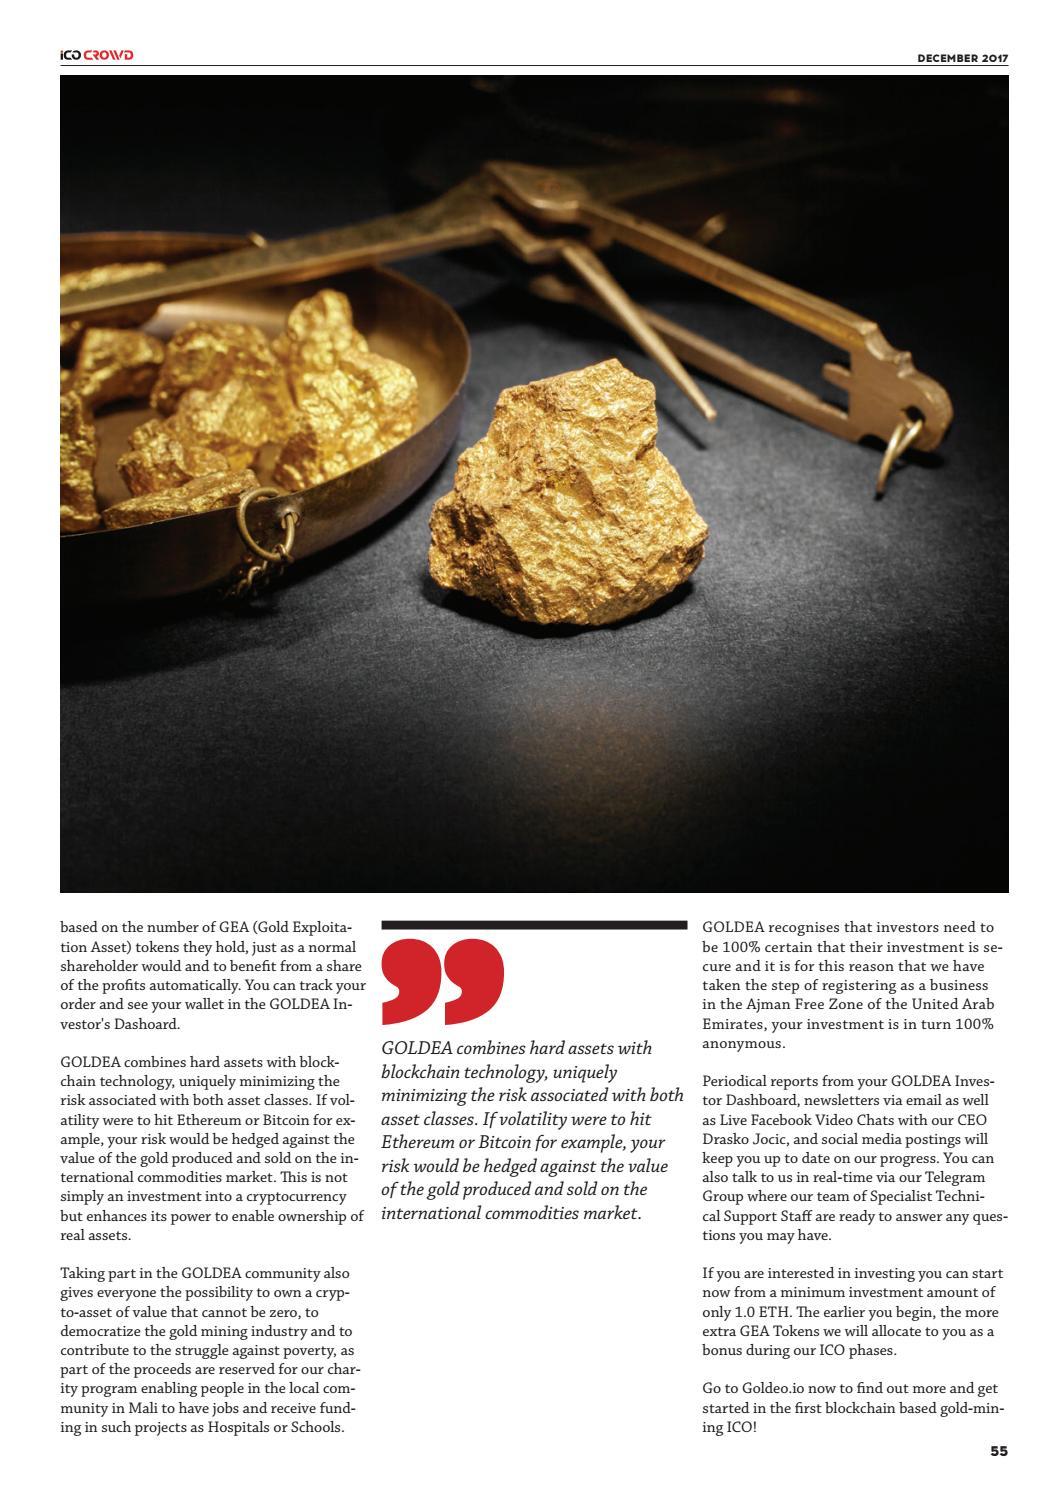 ICO Crowd Magazine Issue 4 by Ico Crowd - issuu